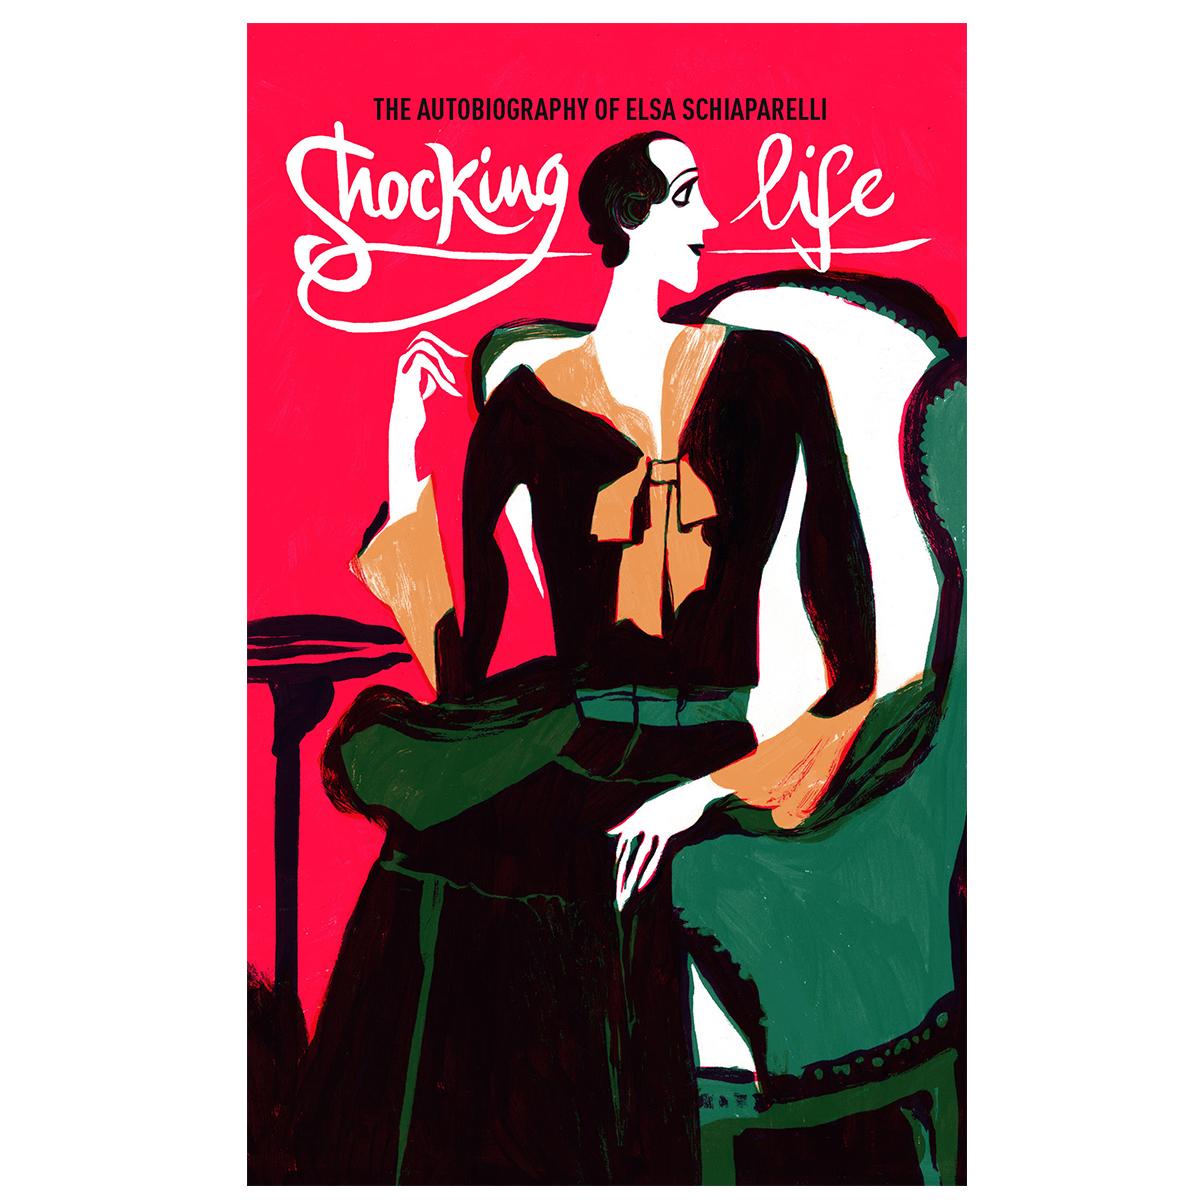 Shocking Life: The Autobiography of Elsa Schiaparelli